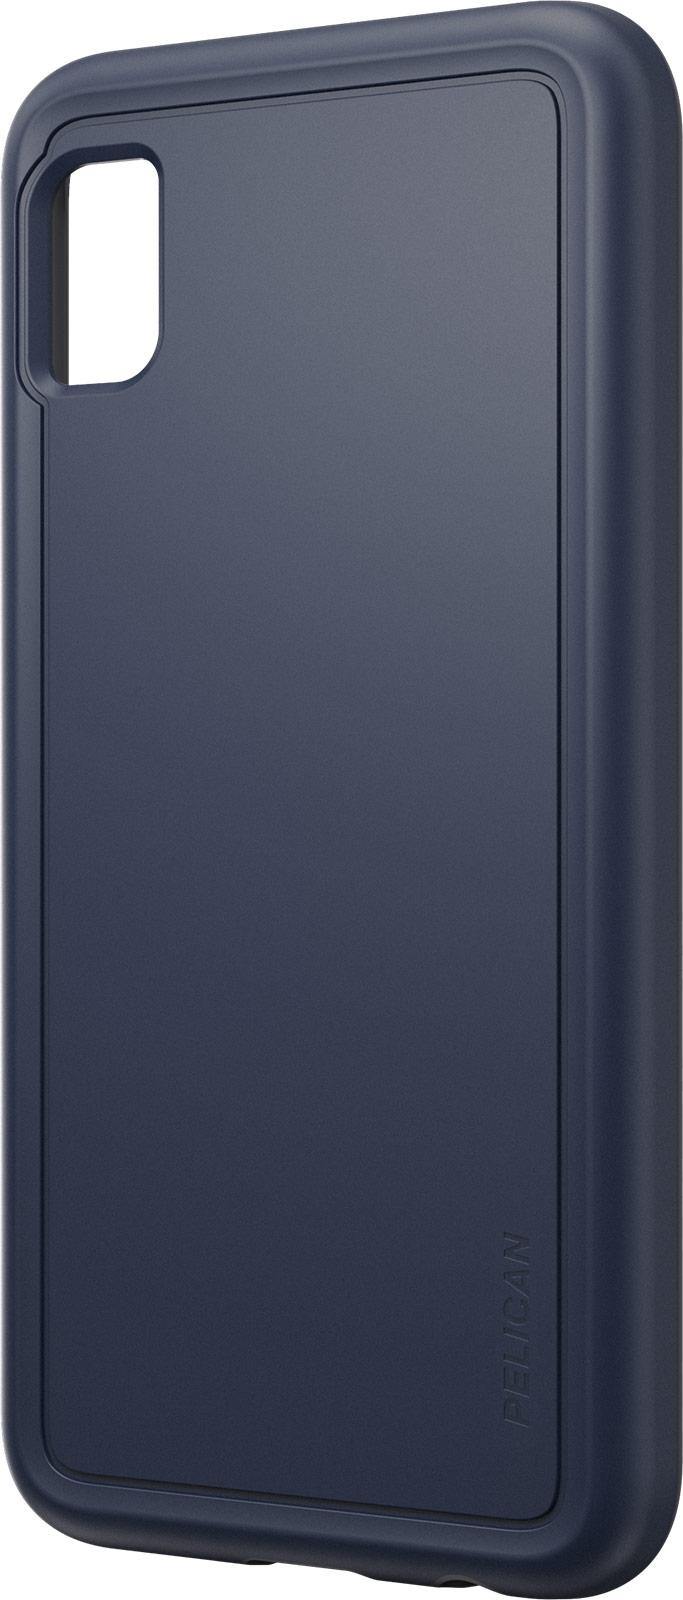 pelican c52100 samsung galaxy a10e phone case